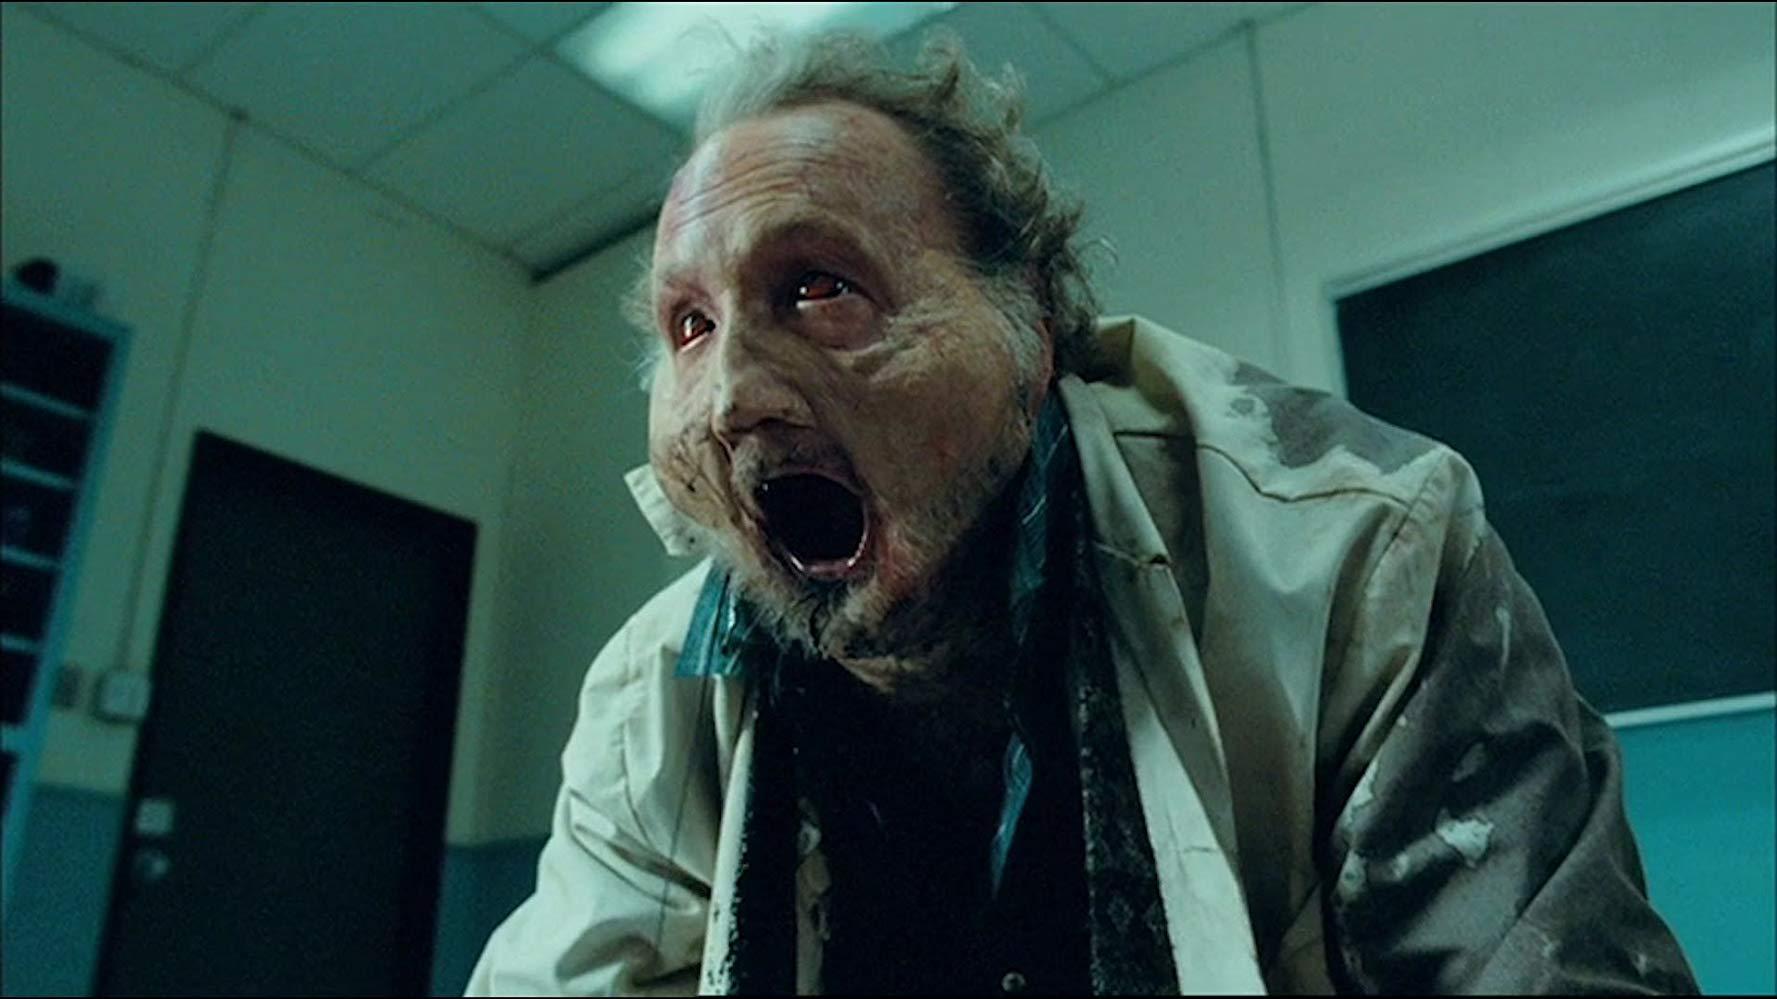 Robert Englund undergoes transformation in Jack Brooks, Monster Slayer (2007)